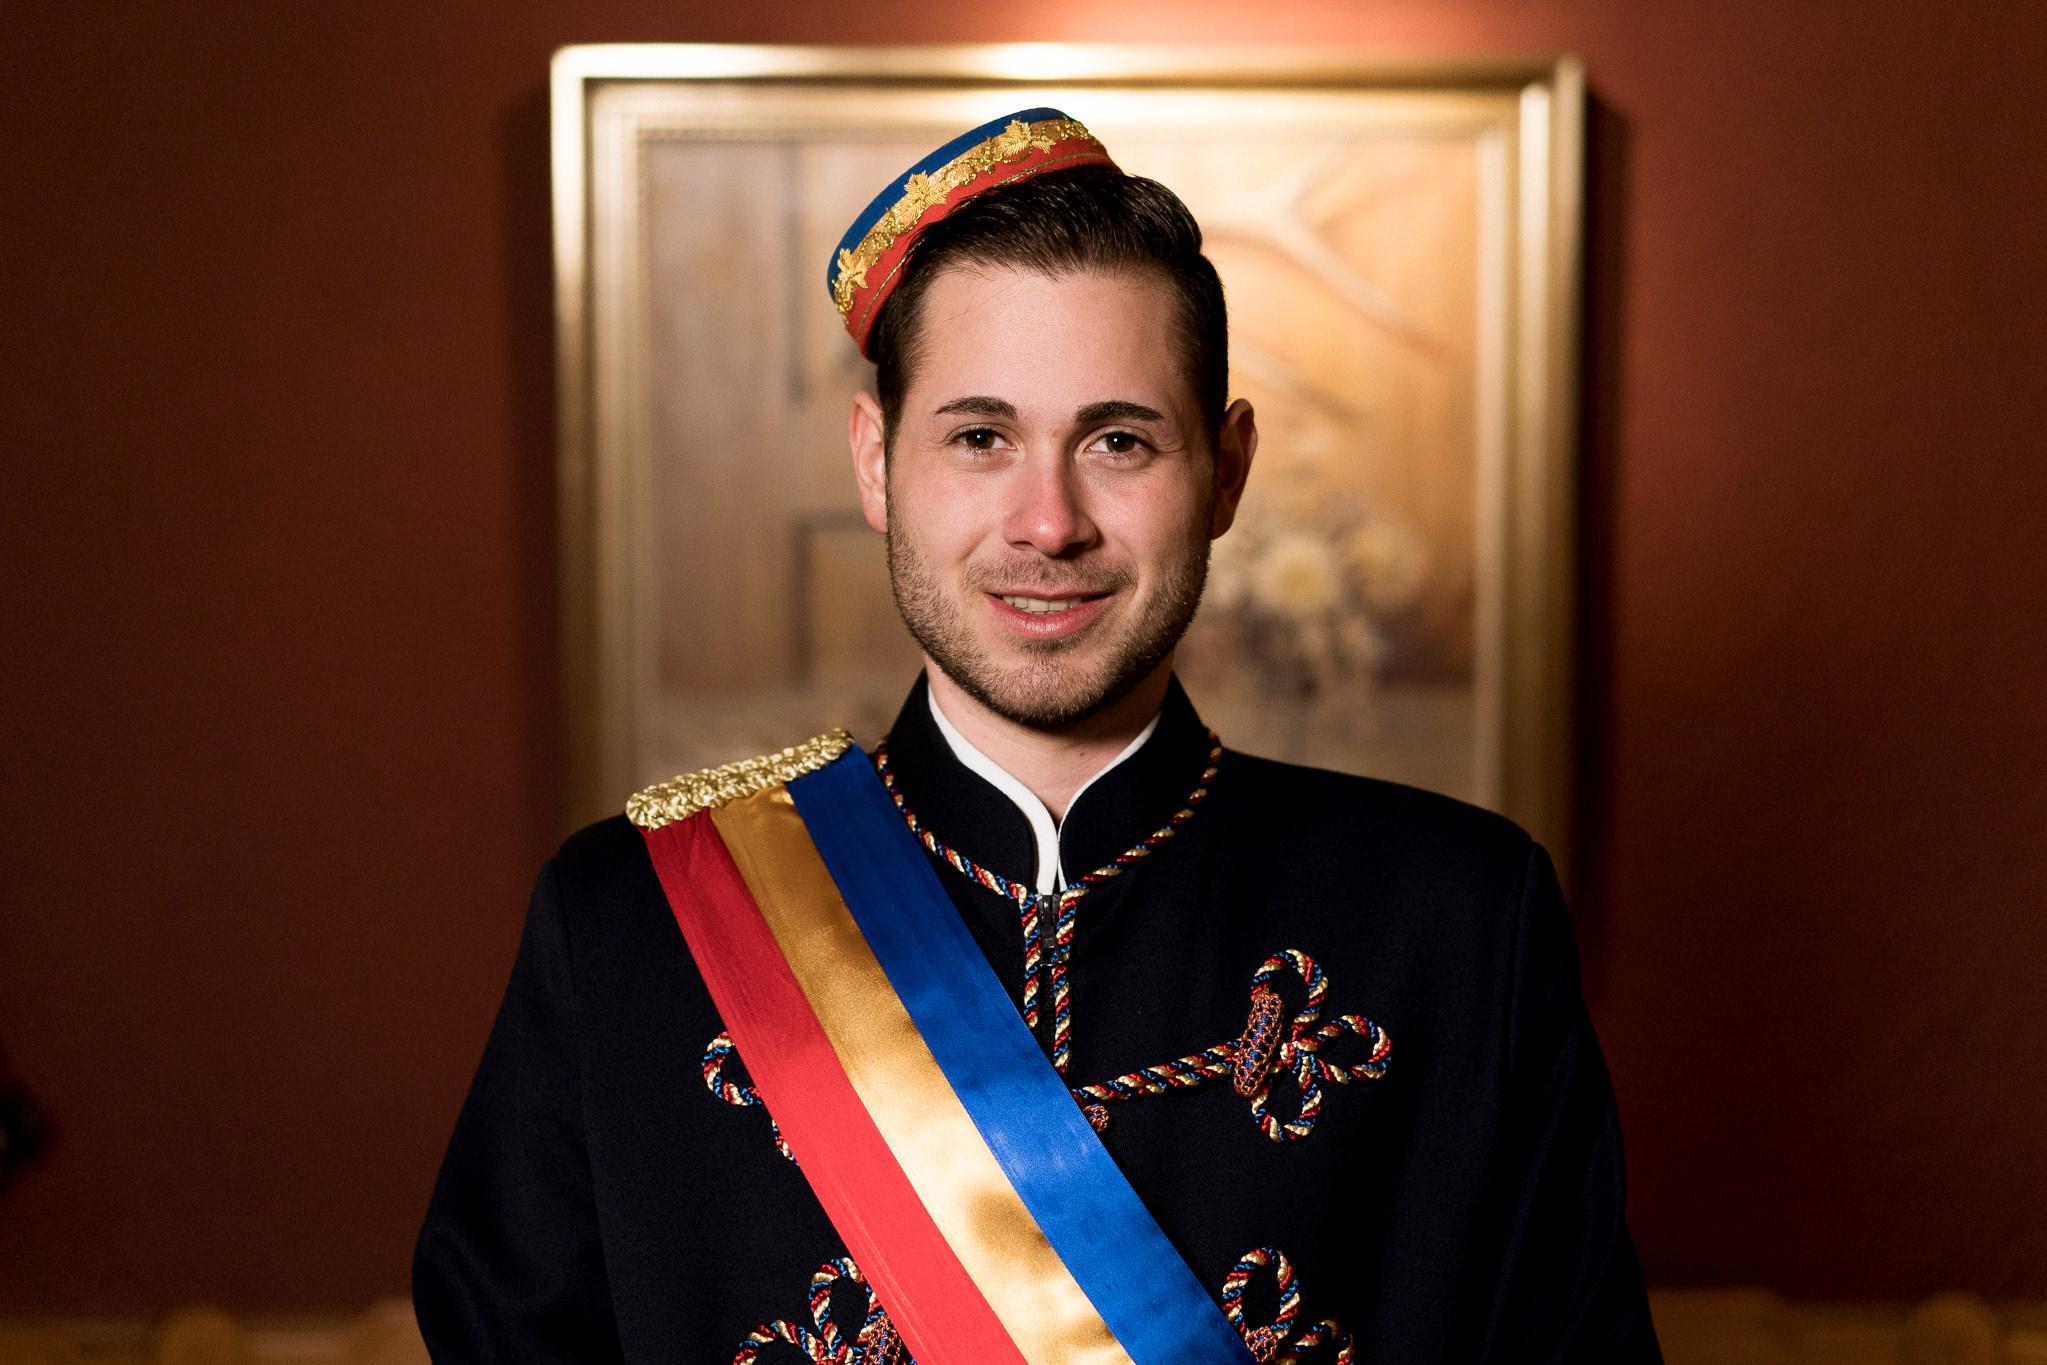 Johannes Allgäuer v/o Felix